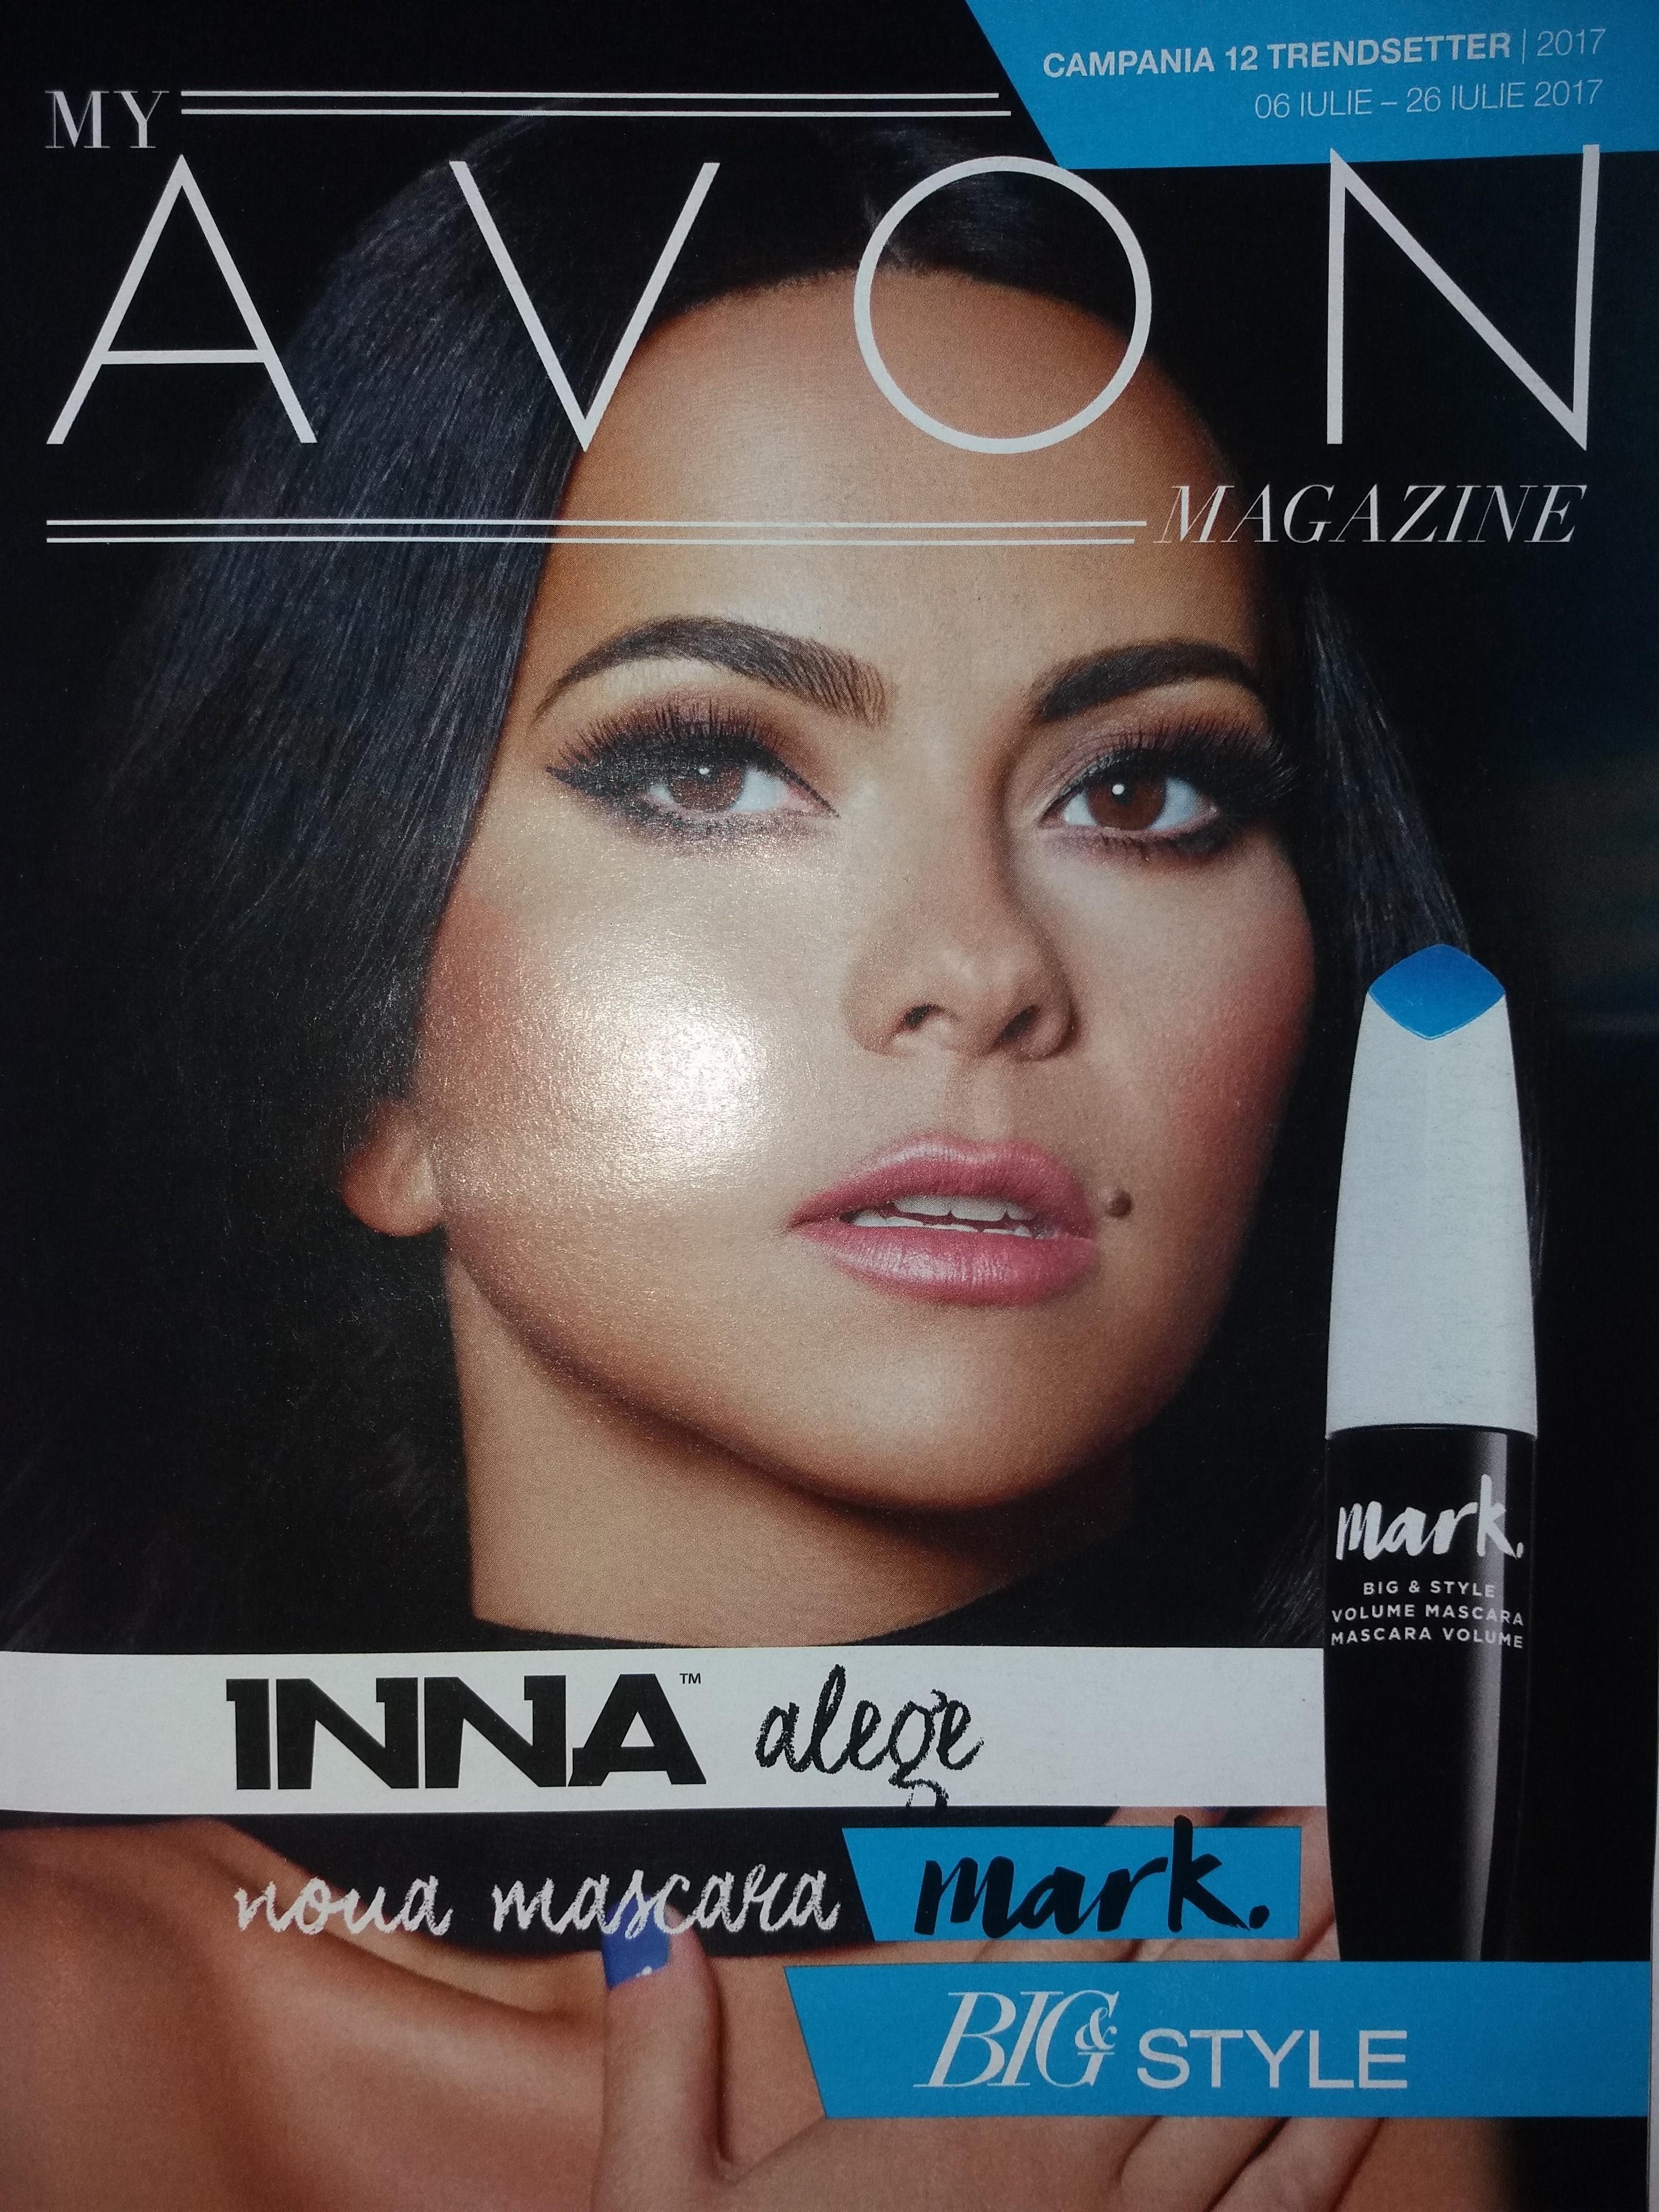 Catalog My Avon Magazine Campania 12 2017 - Catalog AZ